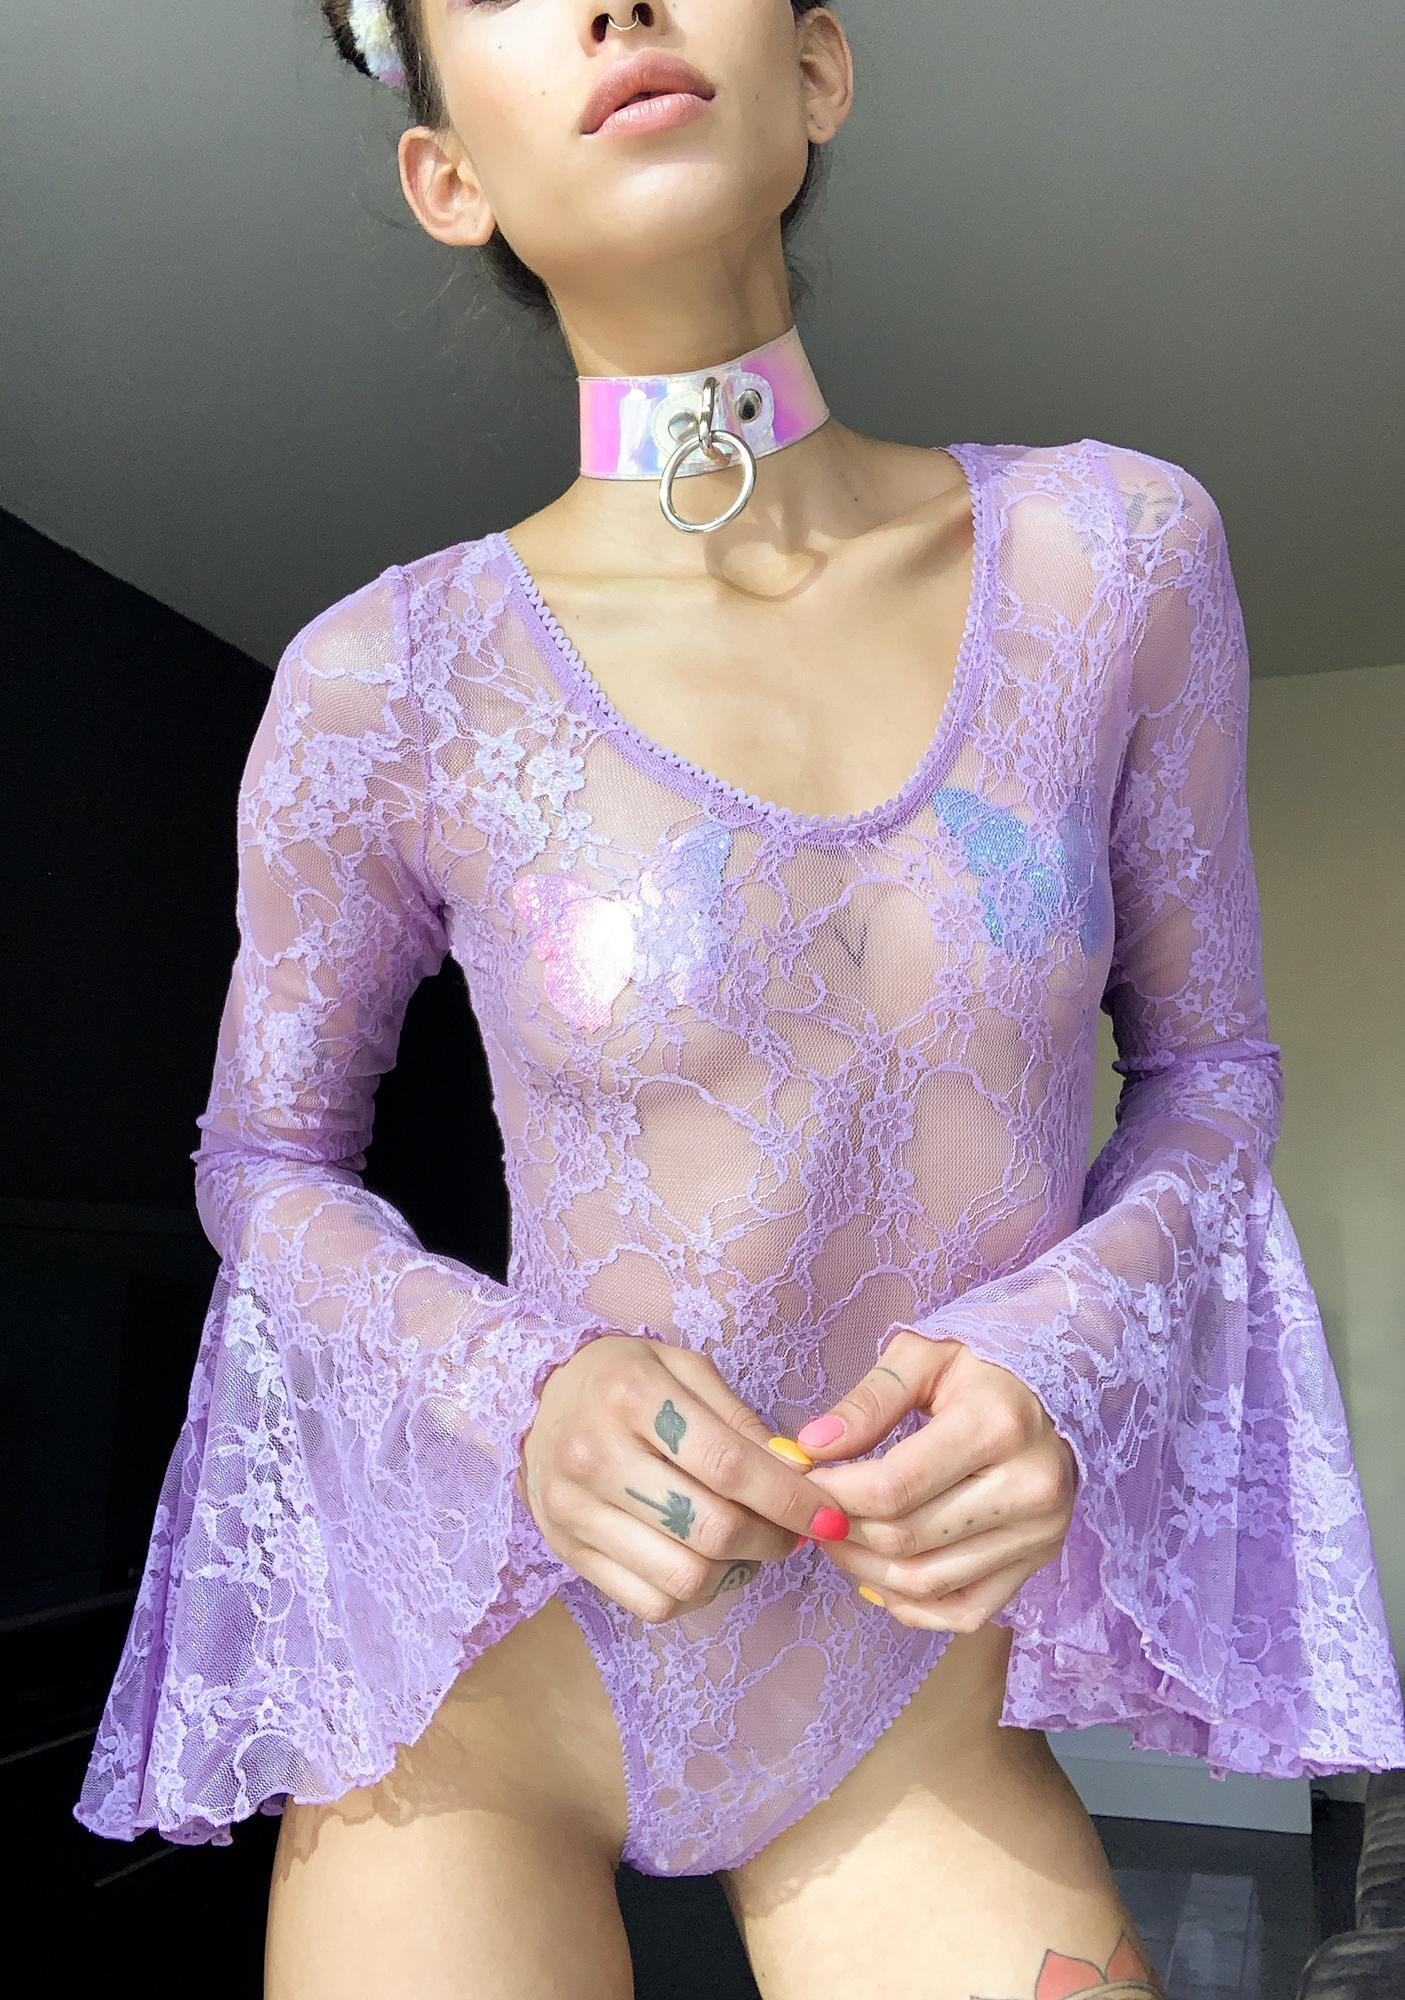 Sugar Thrillz Pixie Dust Lace Bodysuit